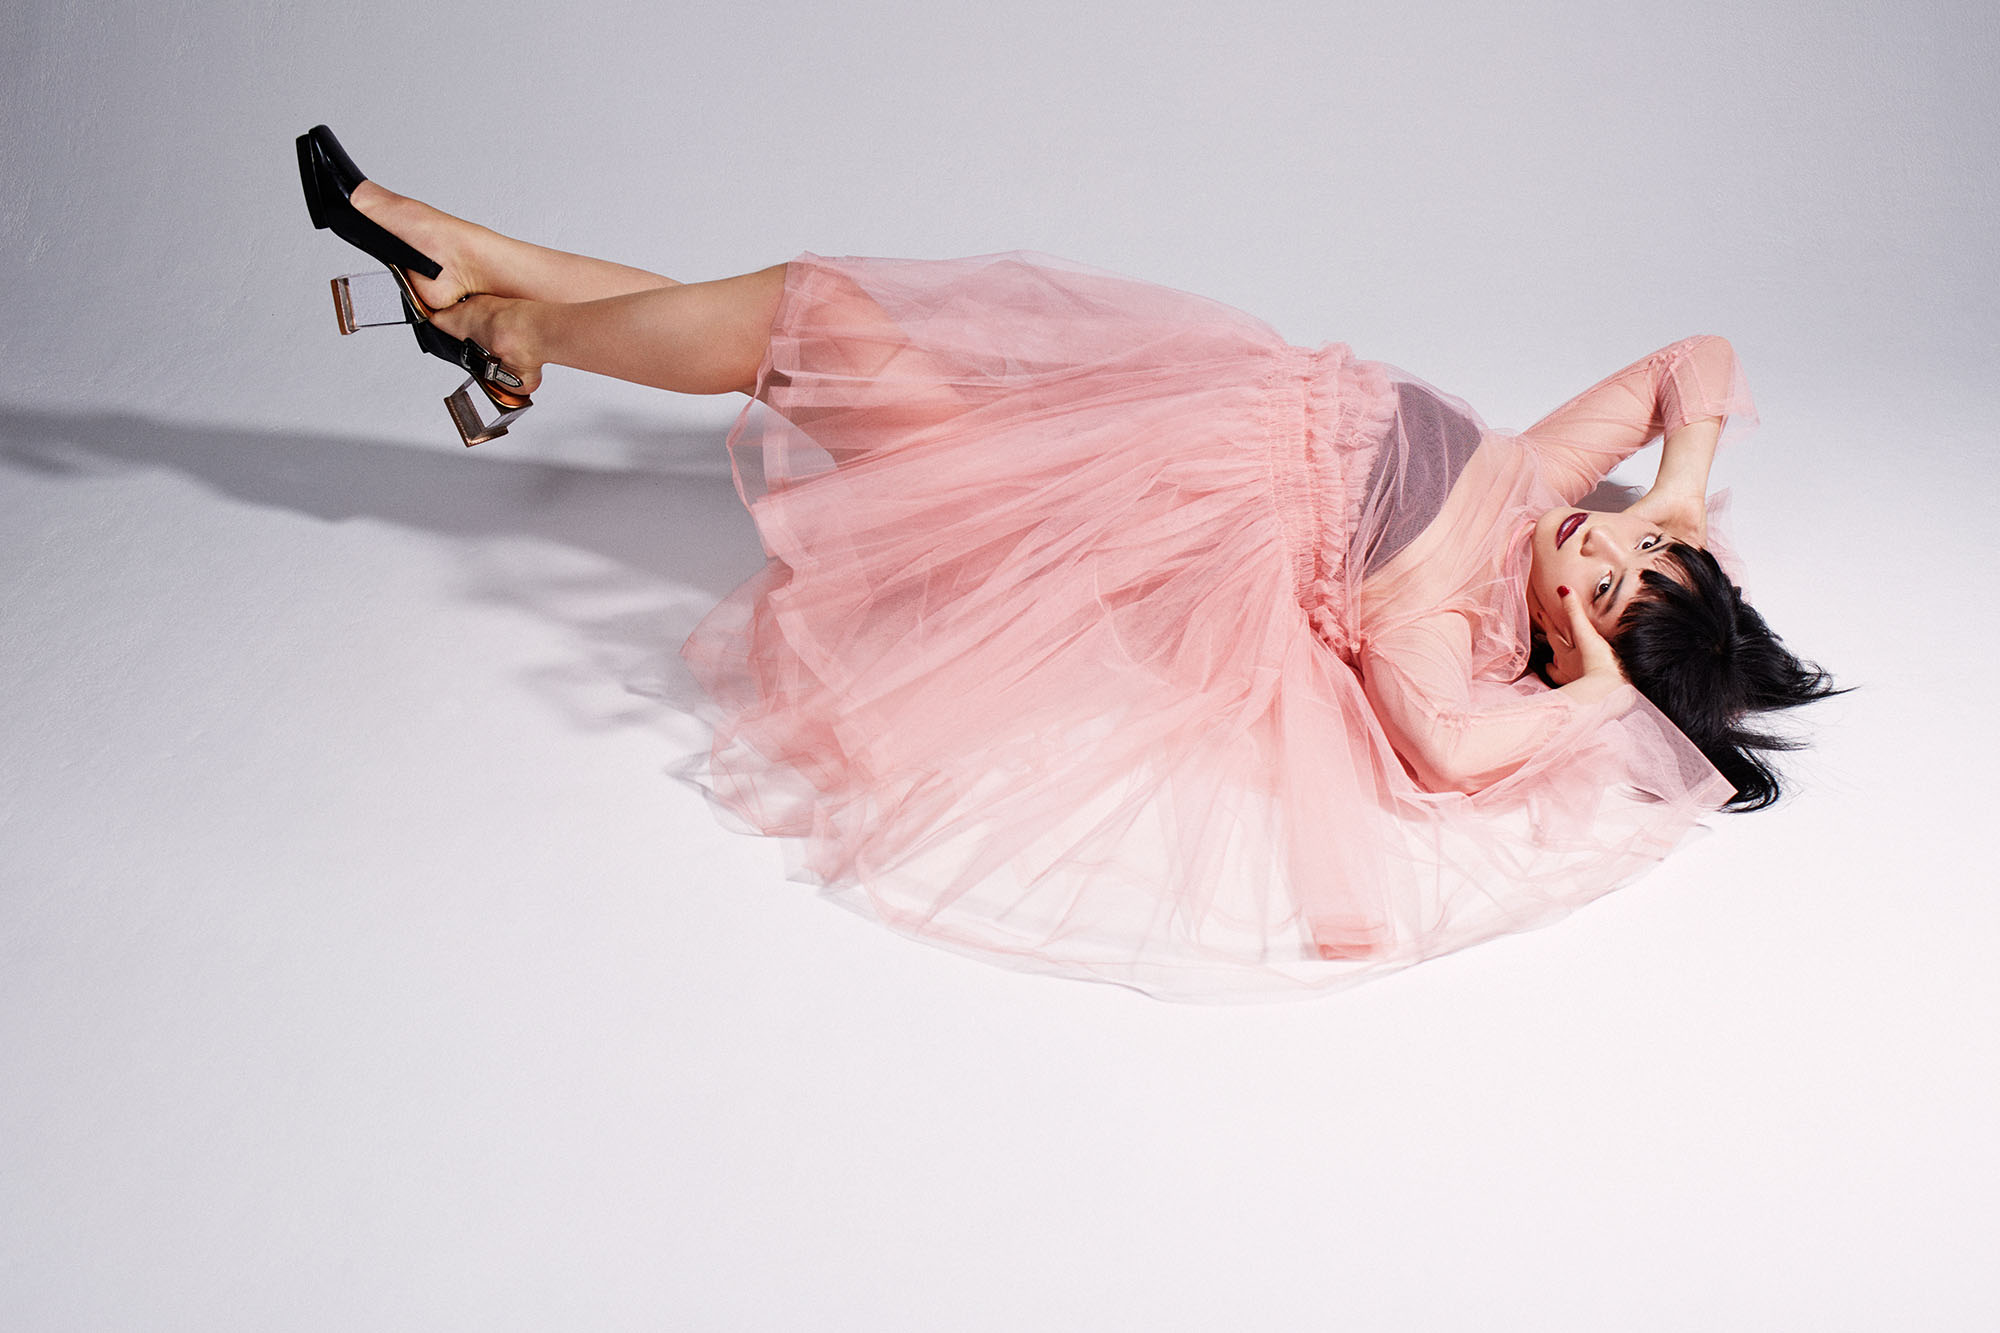 <Koharu Sugawara wears> ドレス ¥ 147,000/Molly Goddard (問い合わせ先/TRADING MUSIUM COMME des GARÇONS)、シューズ/TOGA ((問い合わせ先/TOGA 原宿店)、ジュエリー/スタイリスト私物